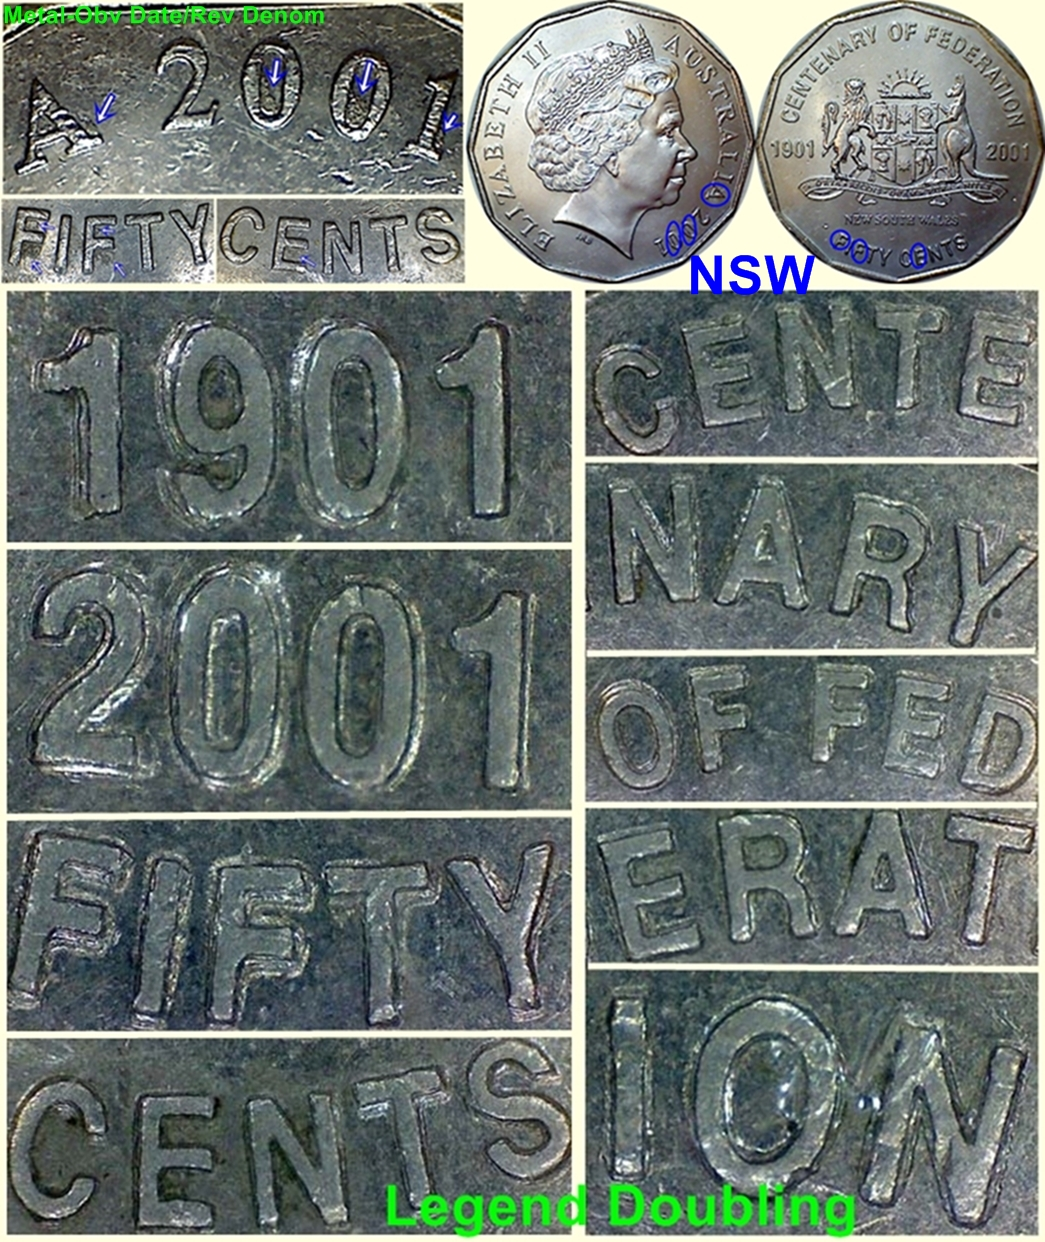 [Image: 50c_2001_C0F_NSW_Combo.jpg]